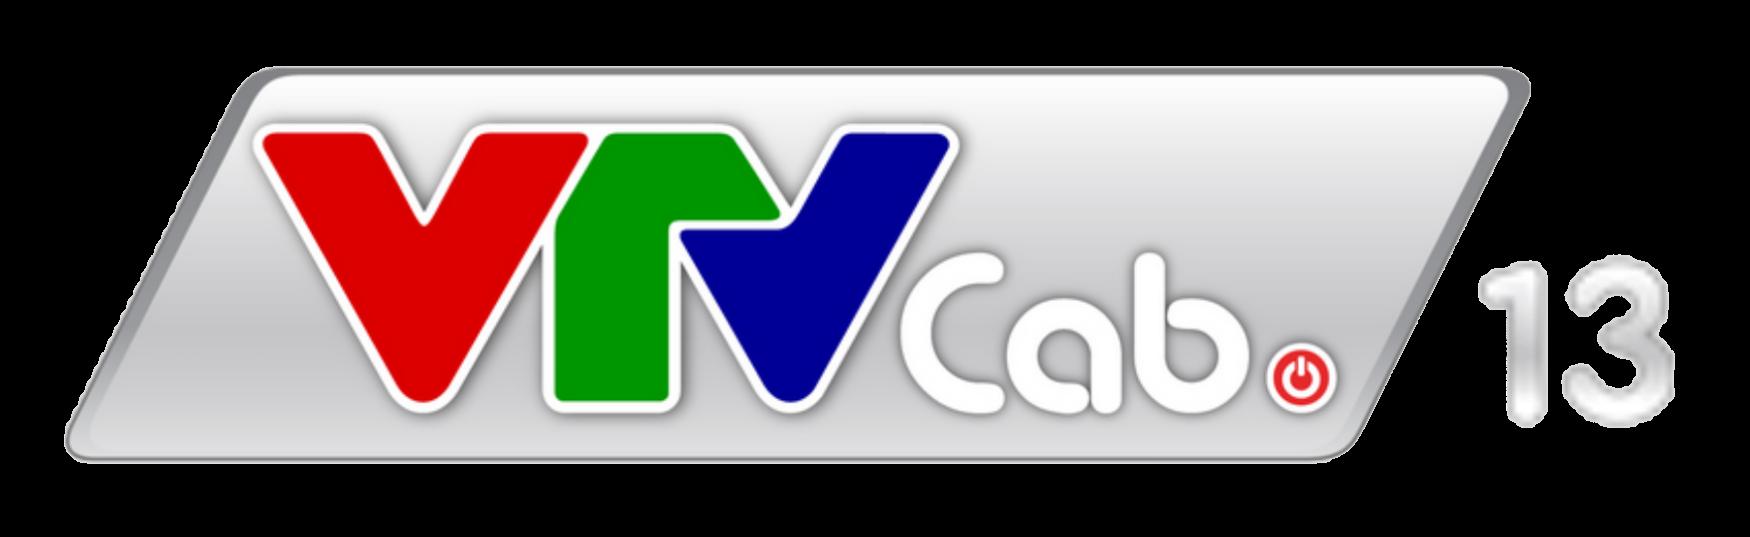 VTVCab13 - VTV Hyundai Home Shopping